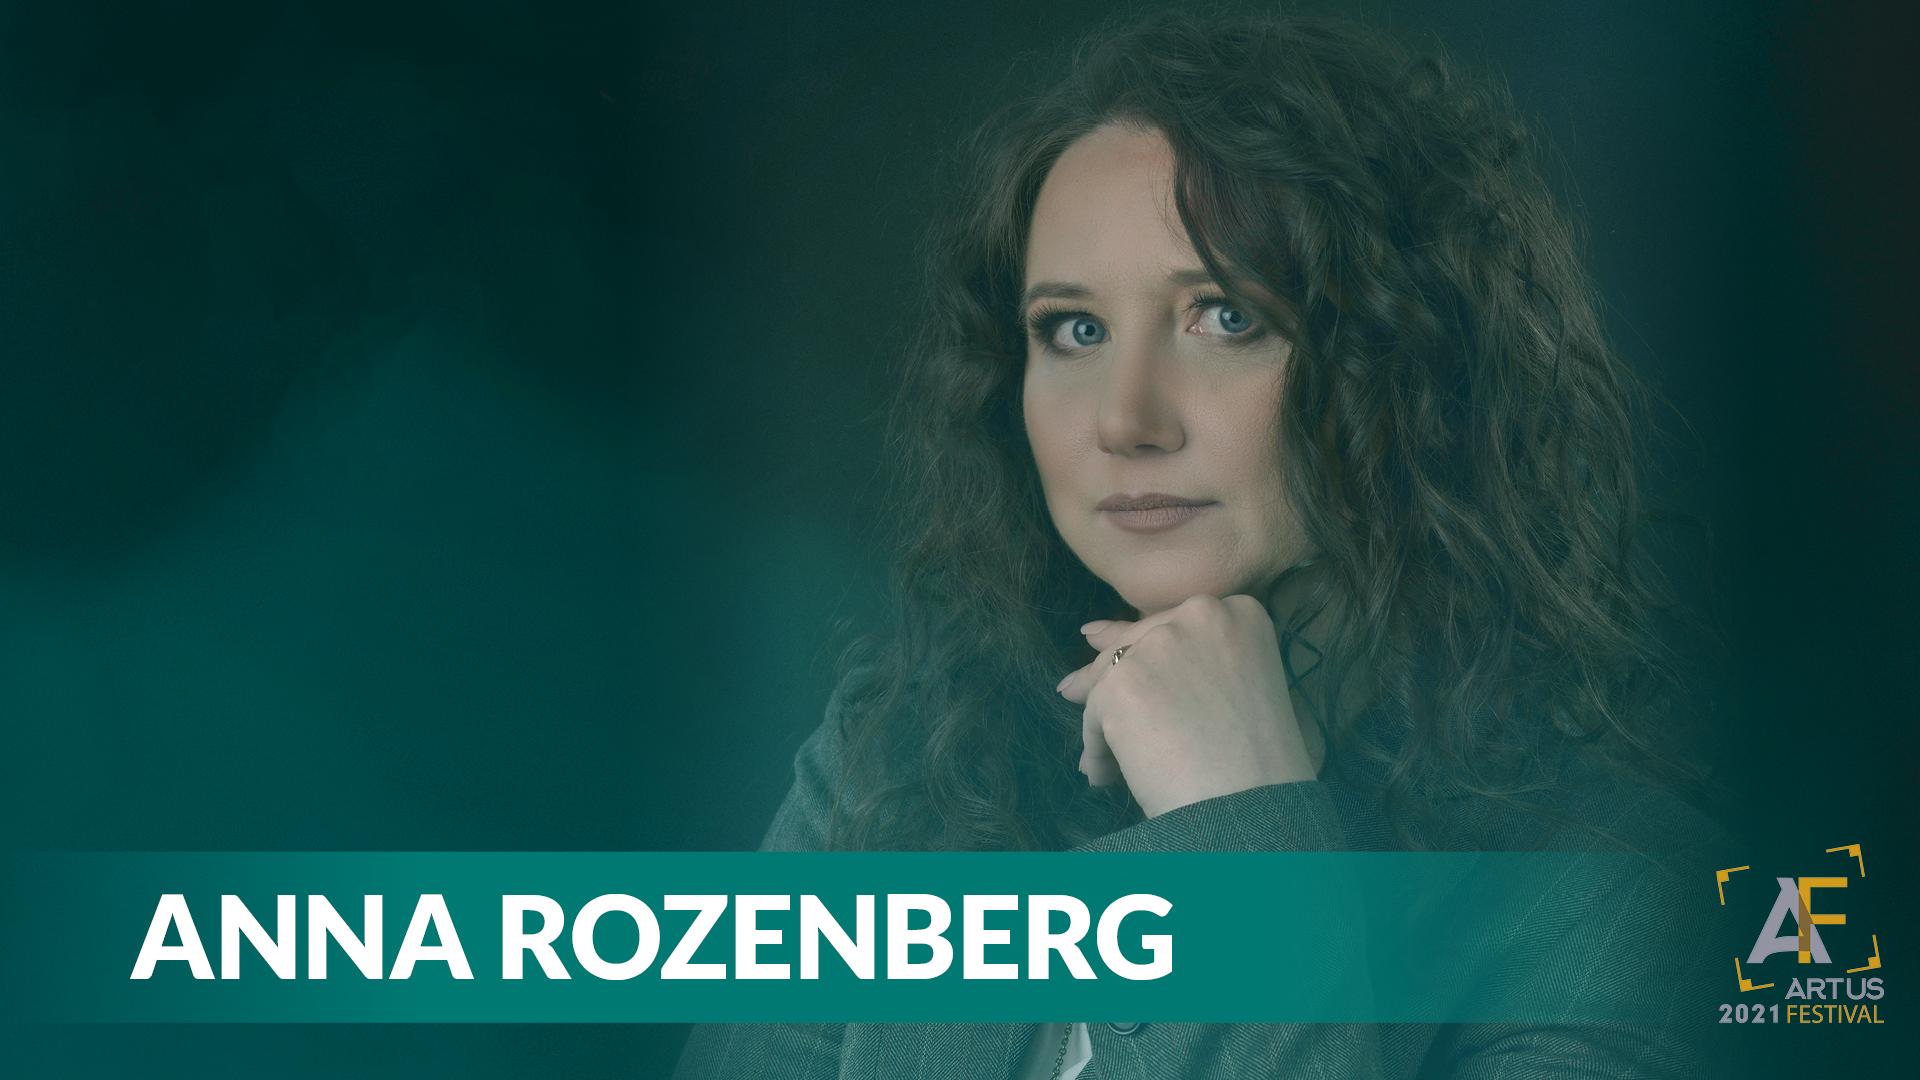 Na zdjęciu Anna Rozenberg